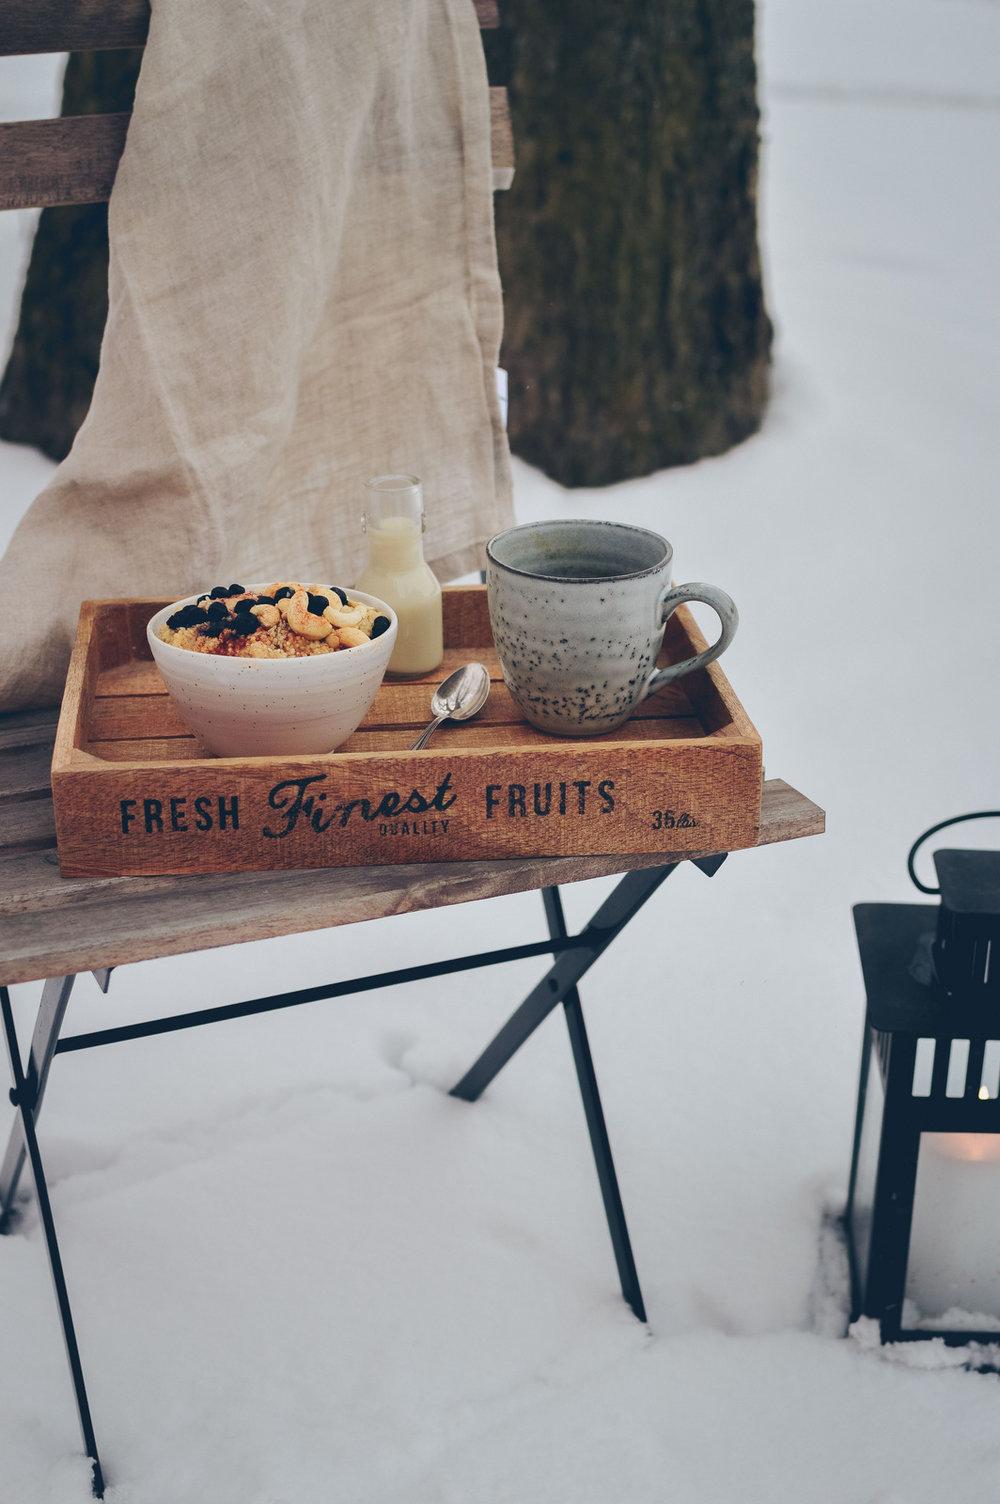 Millet Porridge | The Nordic Kitchen